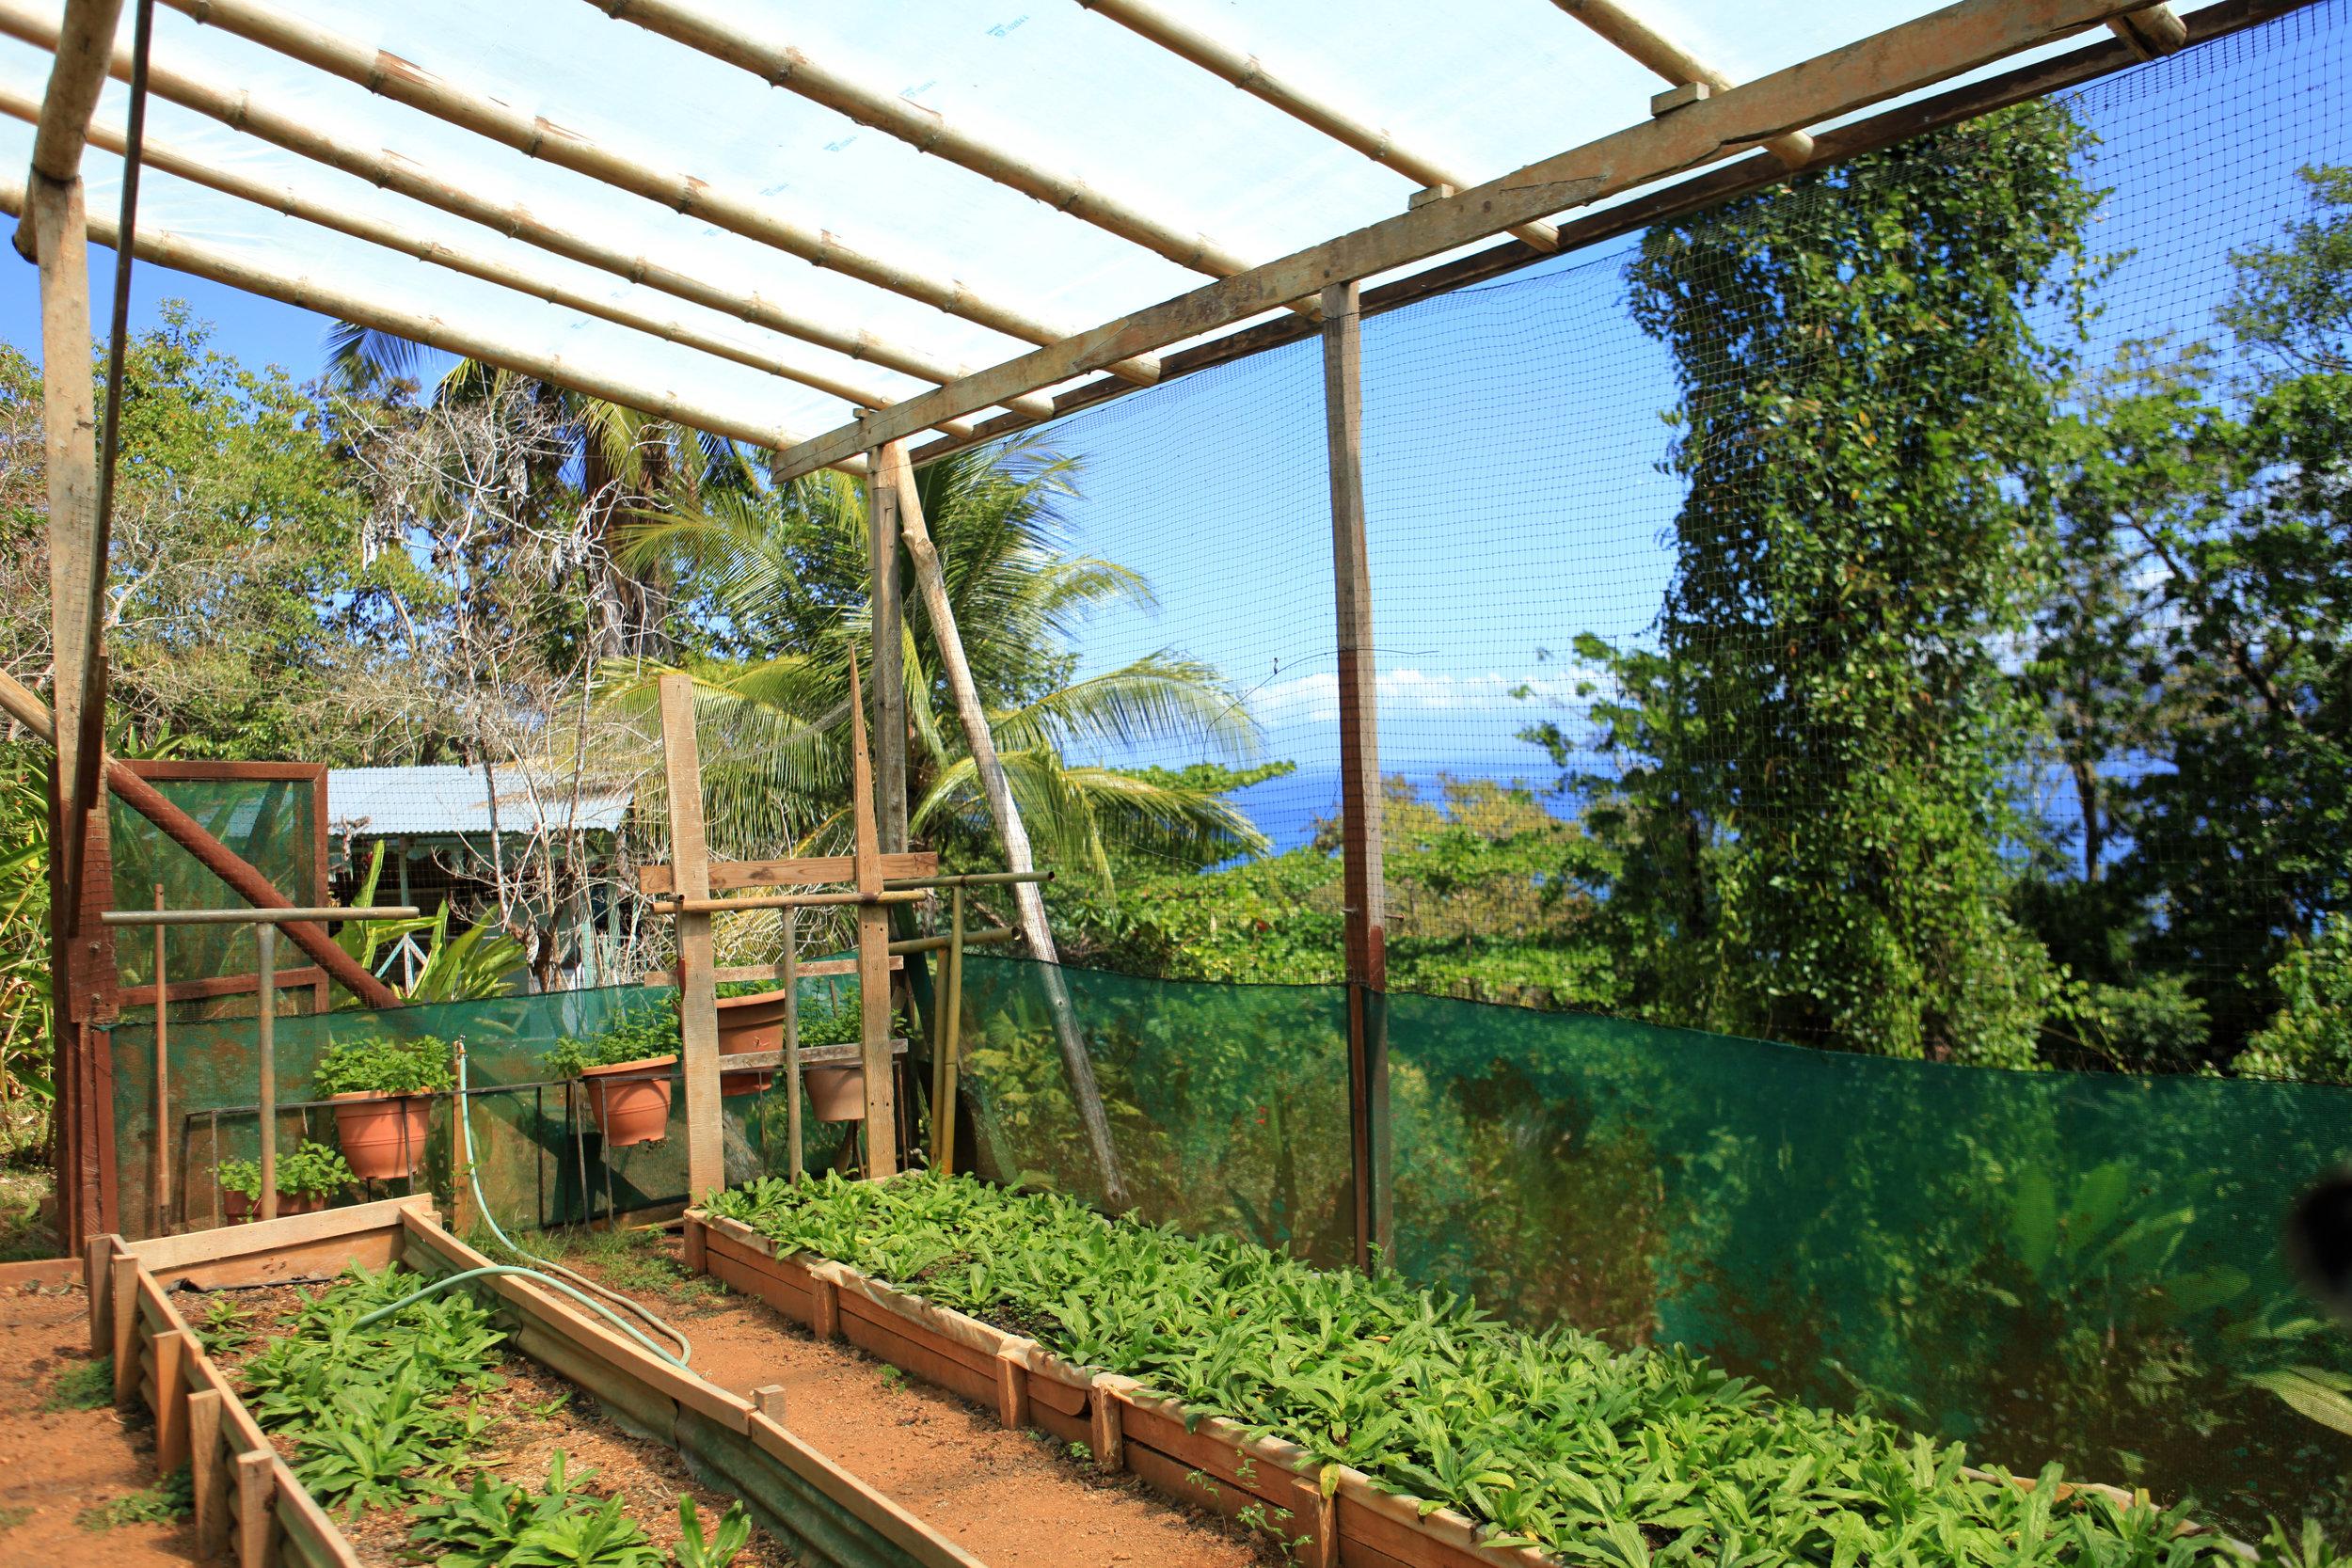 2017-8985-aguiladeosa-garden-produce.jpg